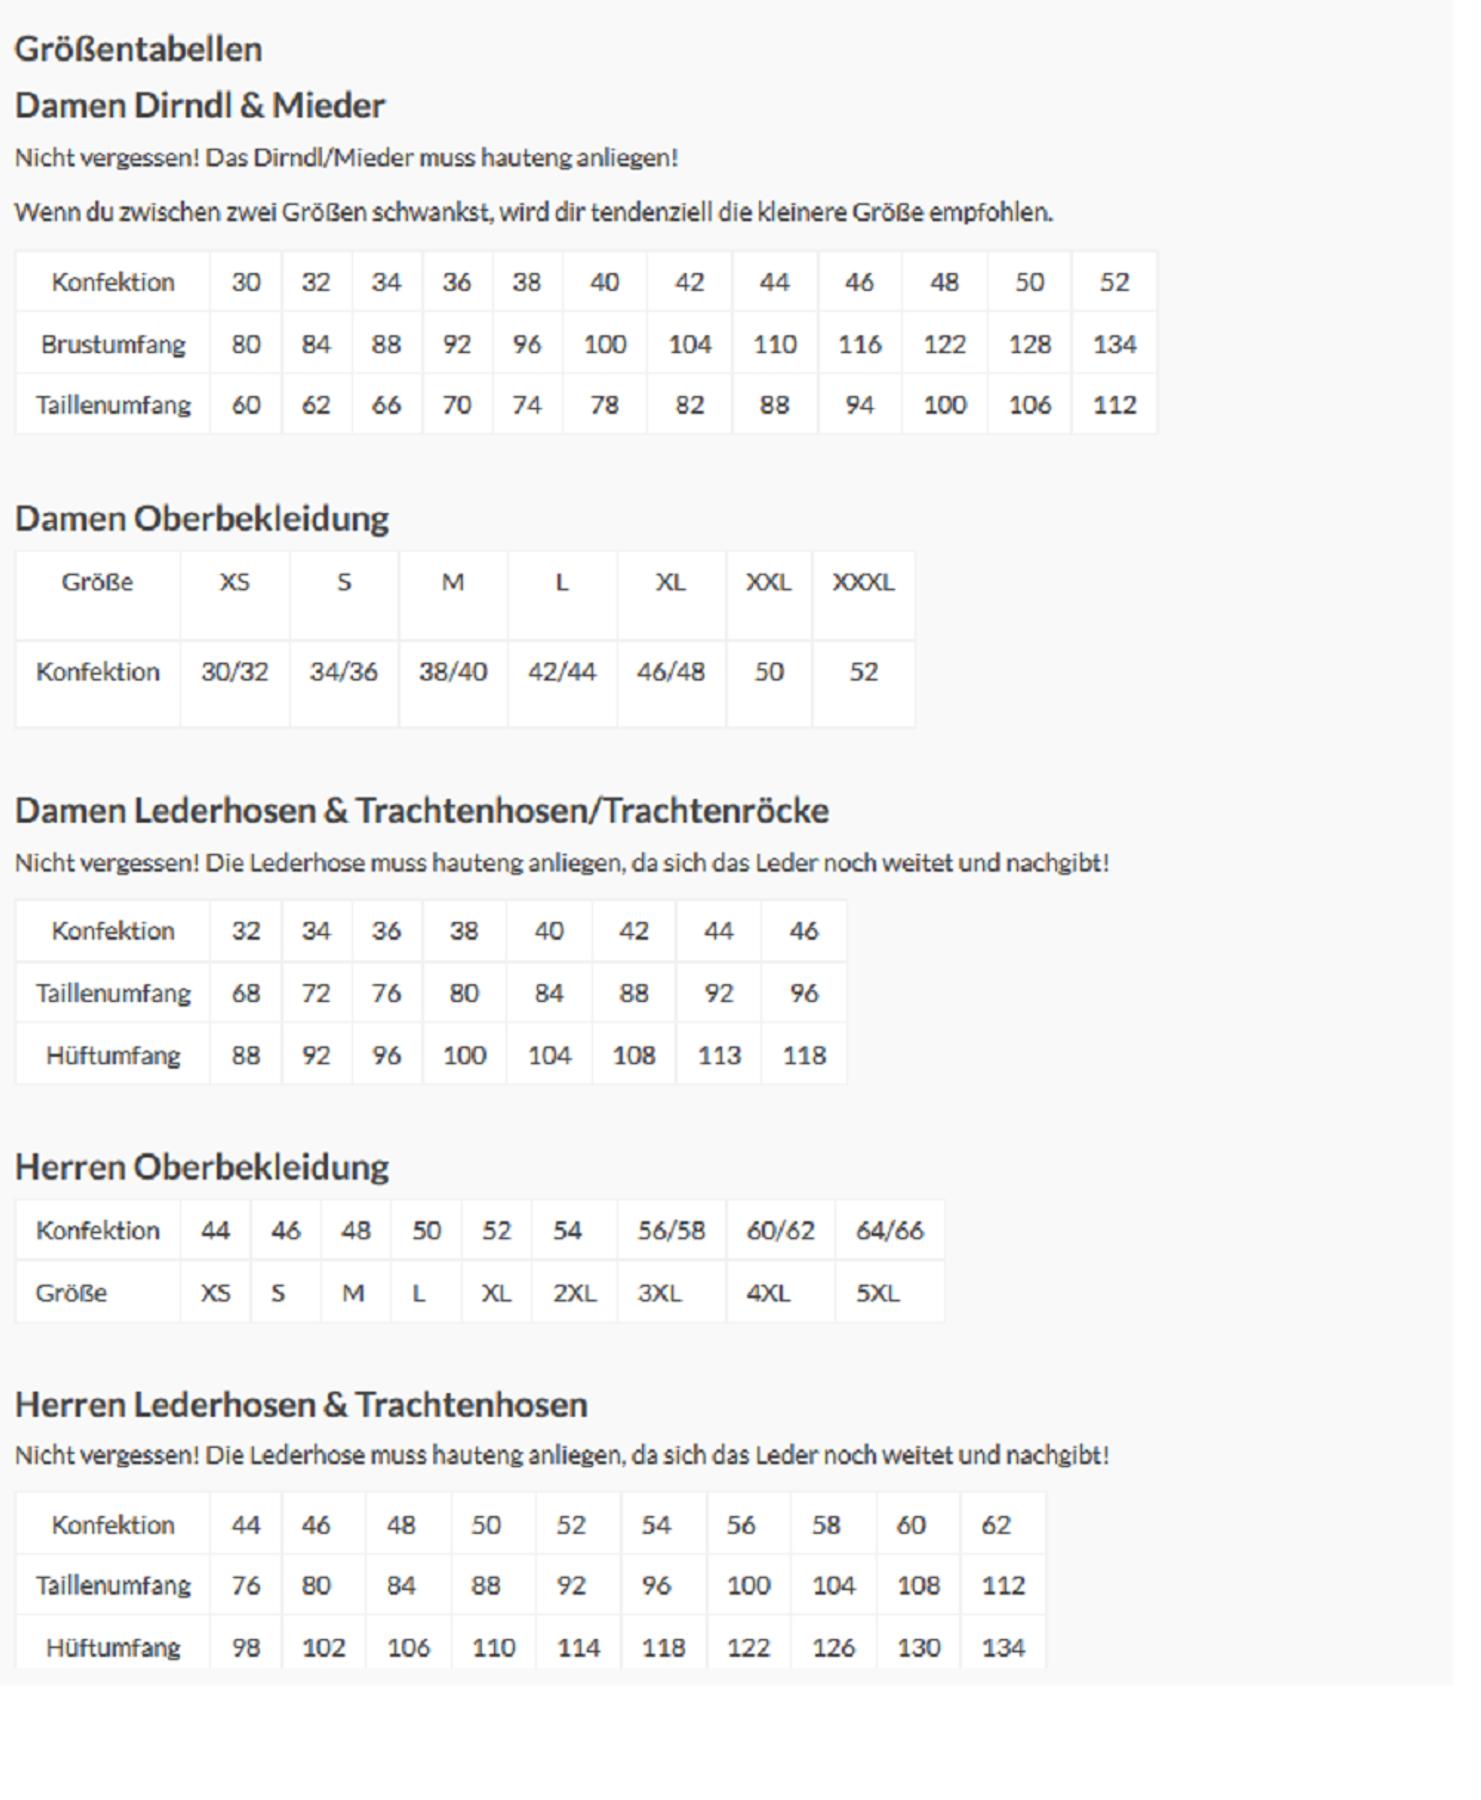 Krüger - Damen Trachtenhose kurz im Lederhosen-Look in Braun, Snugly (natur) (Artikelnummer: 37314-7115) – Bild 4